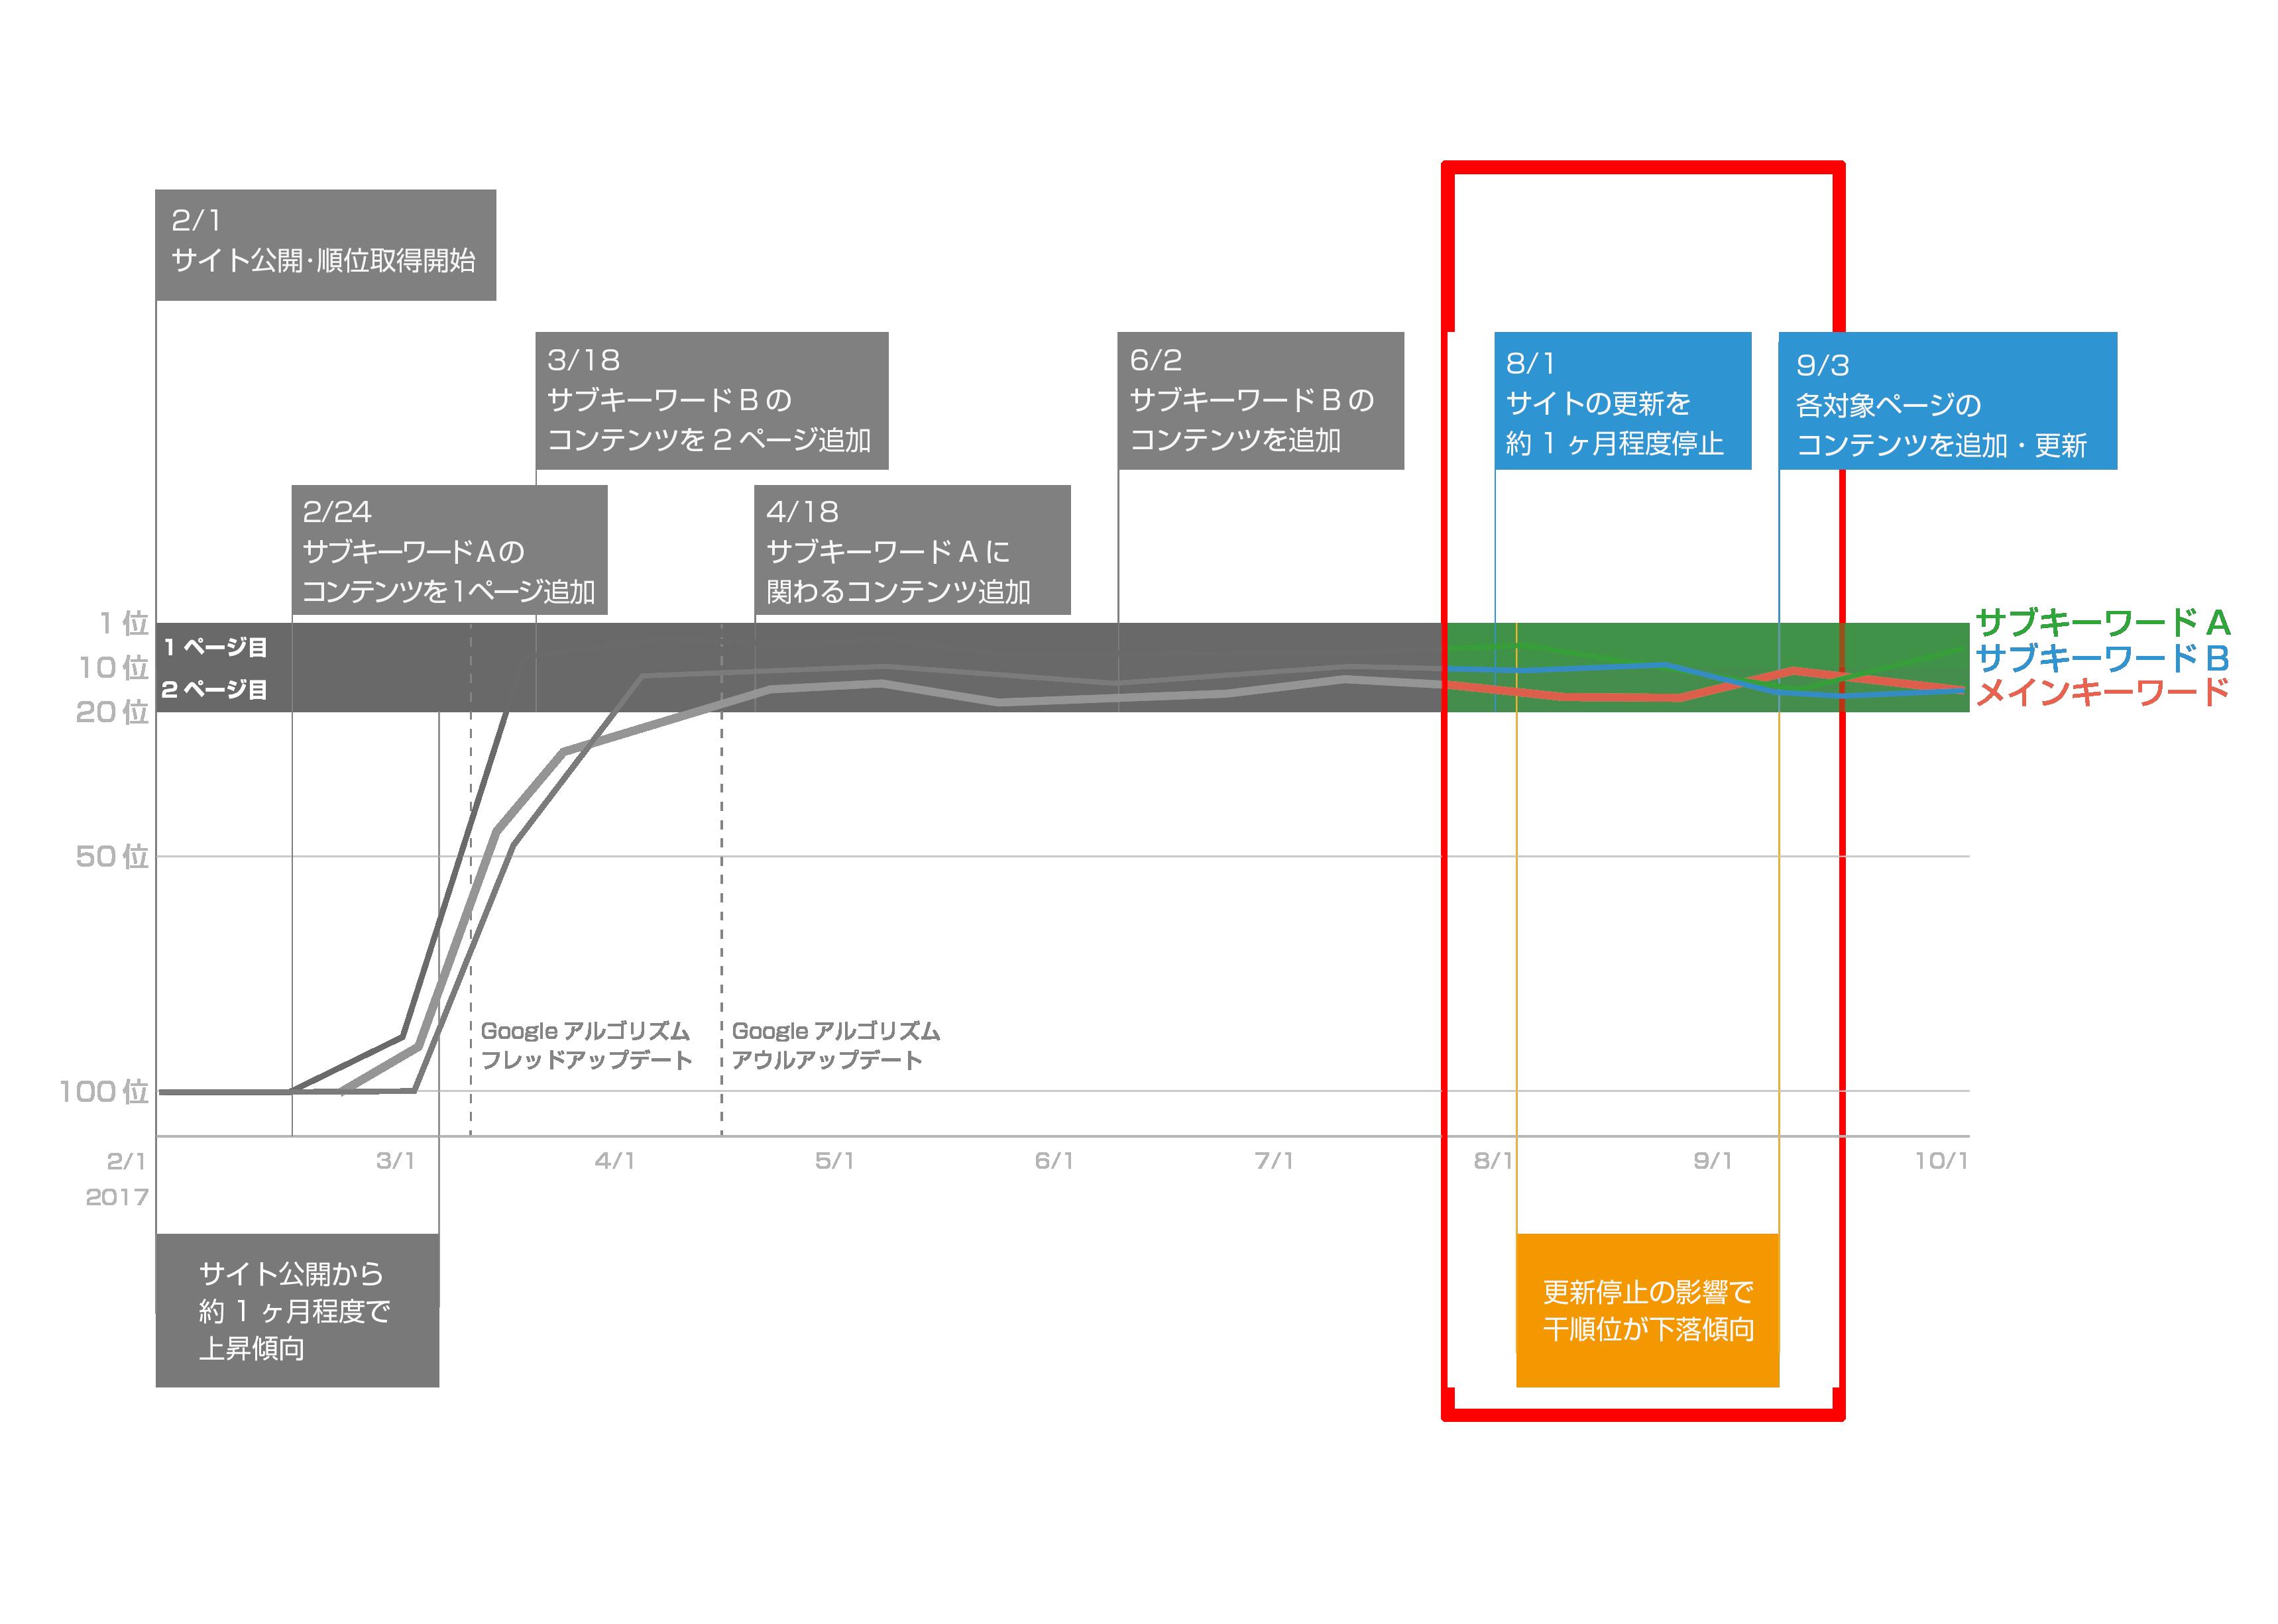 SEO対策の順位グラフと施策3